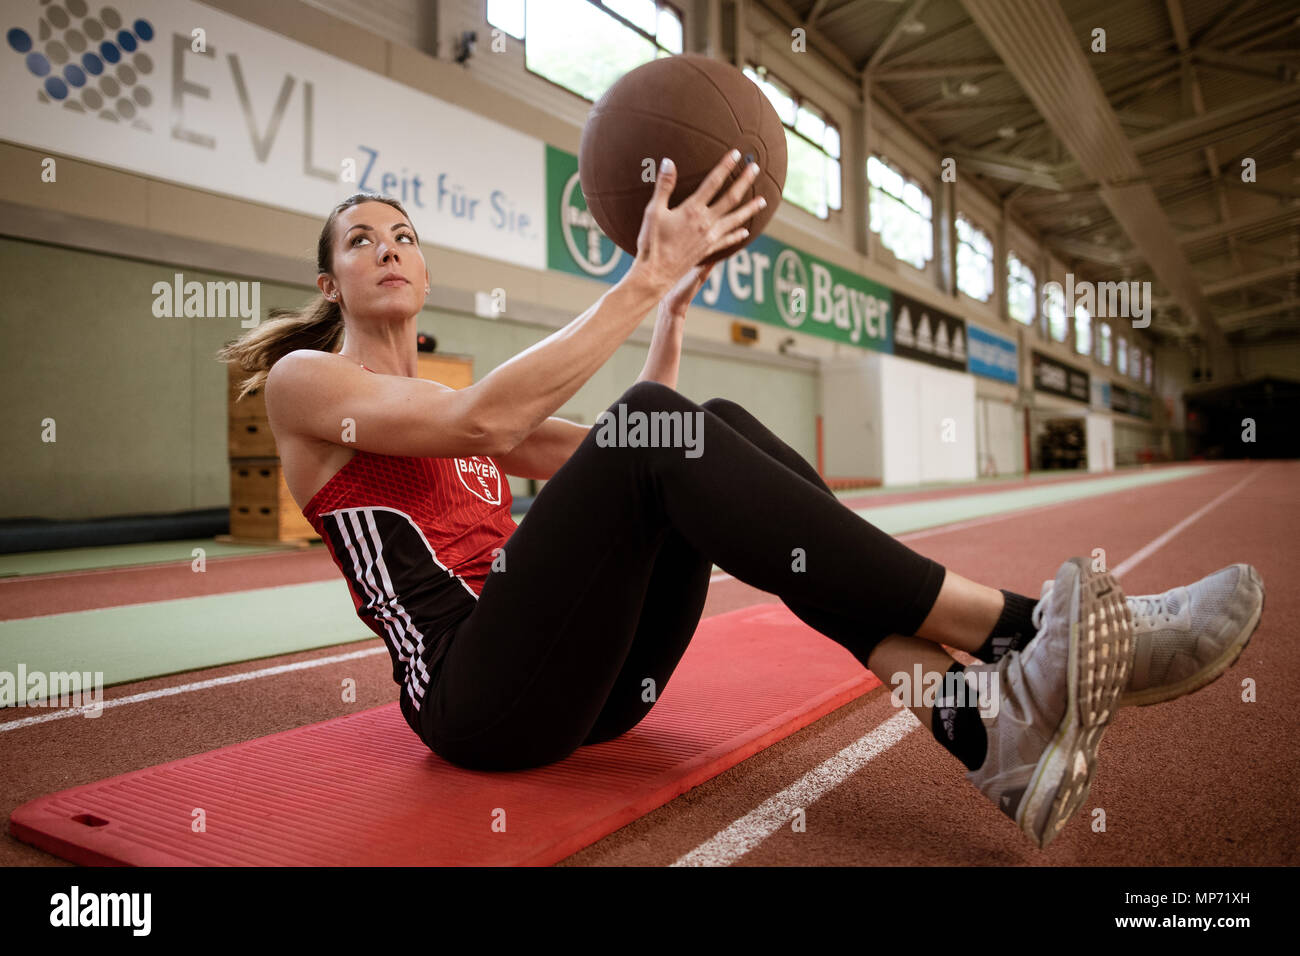 11 May 2018, Germany, Leverkusen: Pole-jumper Katharina Bauer of TSV Bayer 04 Leverkusen trains with a medicine ball. Photo: Marius Becker/dpa - Stock Image